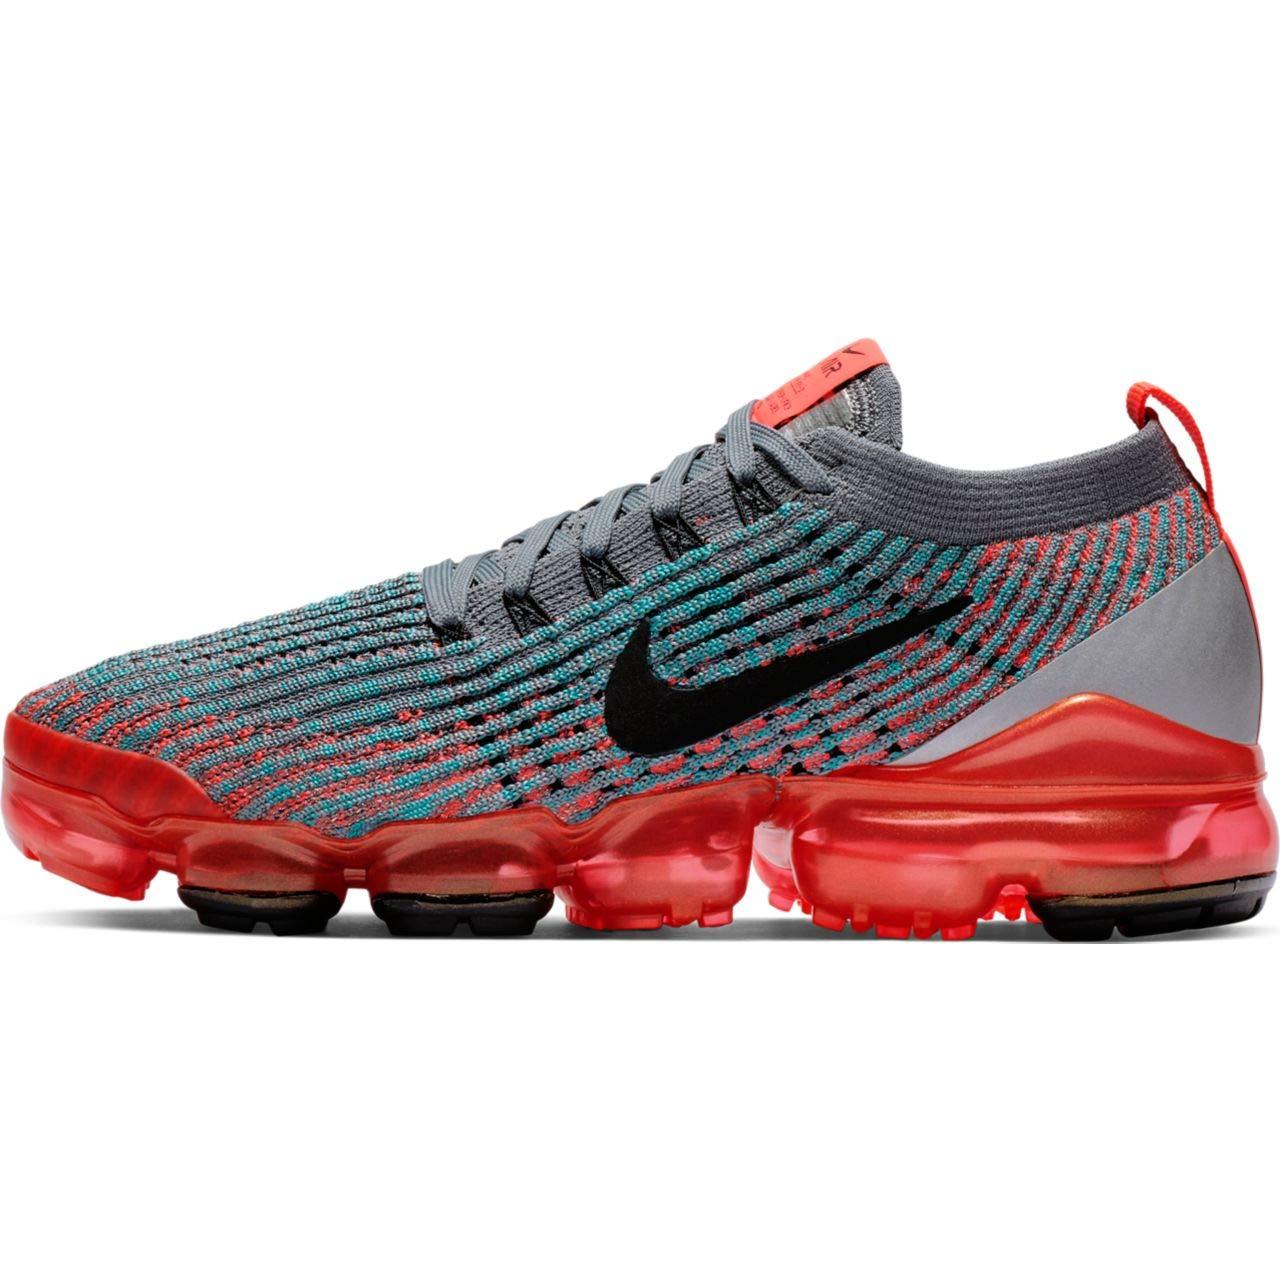 sports shoes a7a9f d6f31 Nike Womens W Air Vapormax Flyknit 3 Flash Crimson/Black-Grey Flyknit